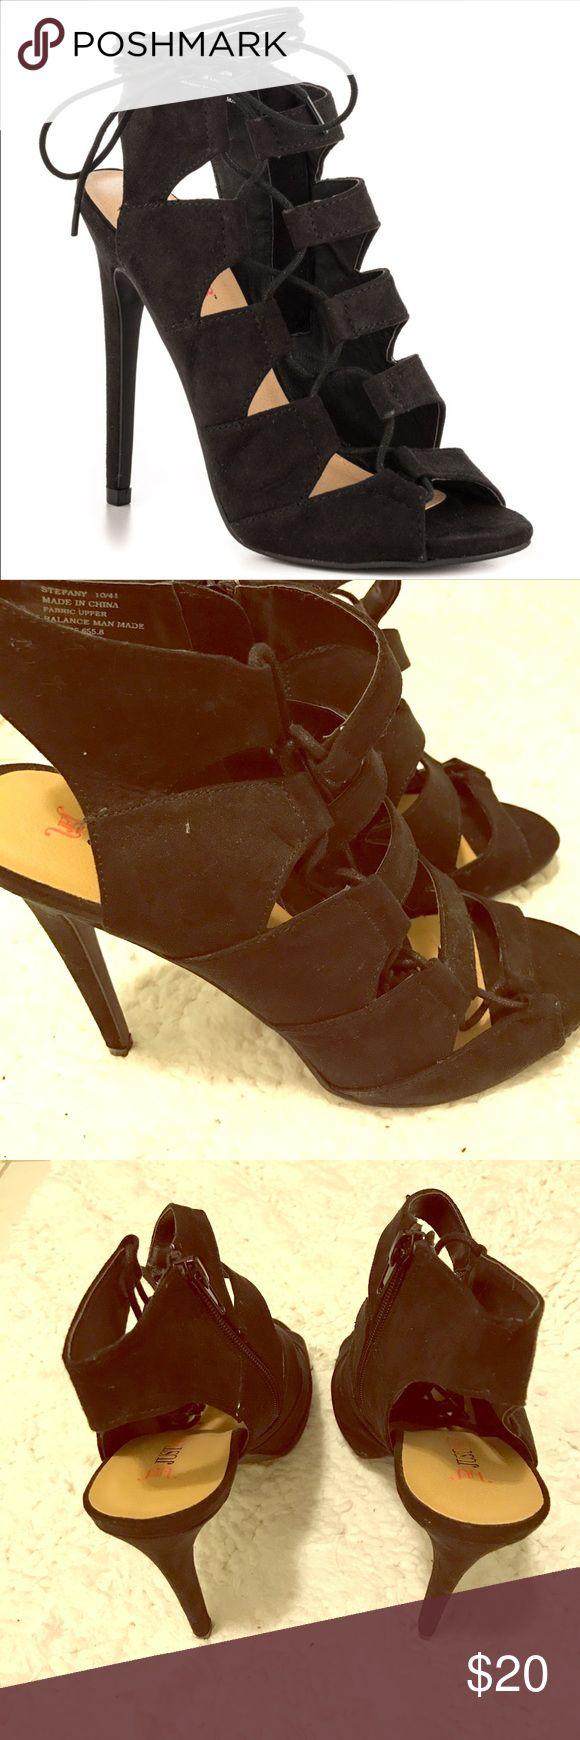 "Women's black gladiator heels Strappy heels wrap around the calf/ 4.5"" heel/ zipper closure/ very sexy/ never worn JustFab Shoes Heels"